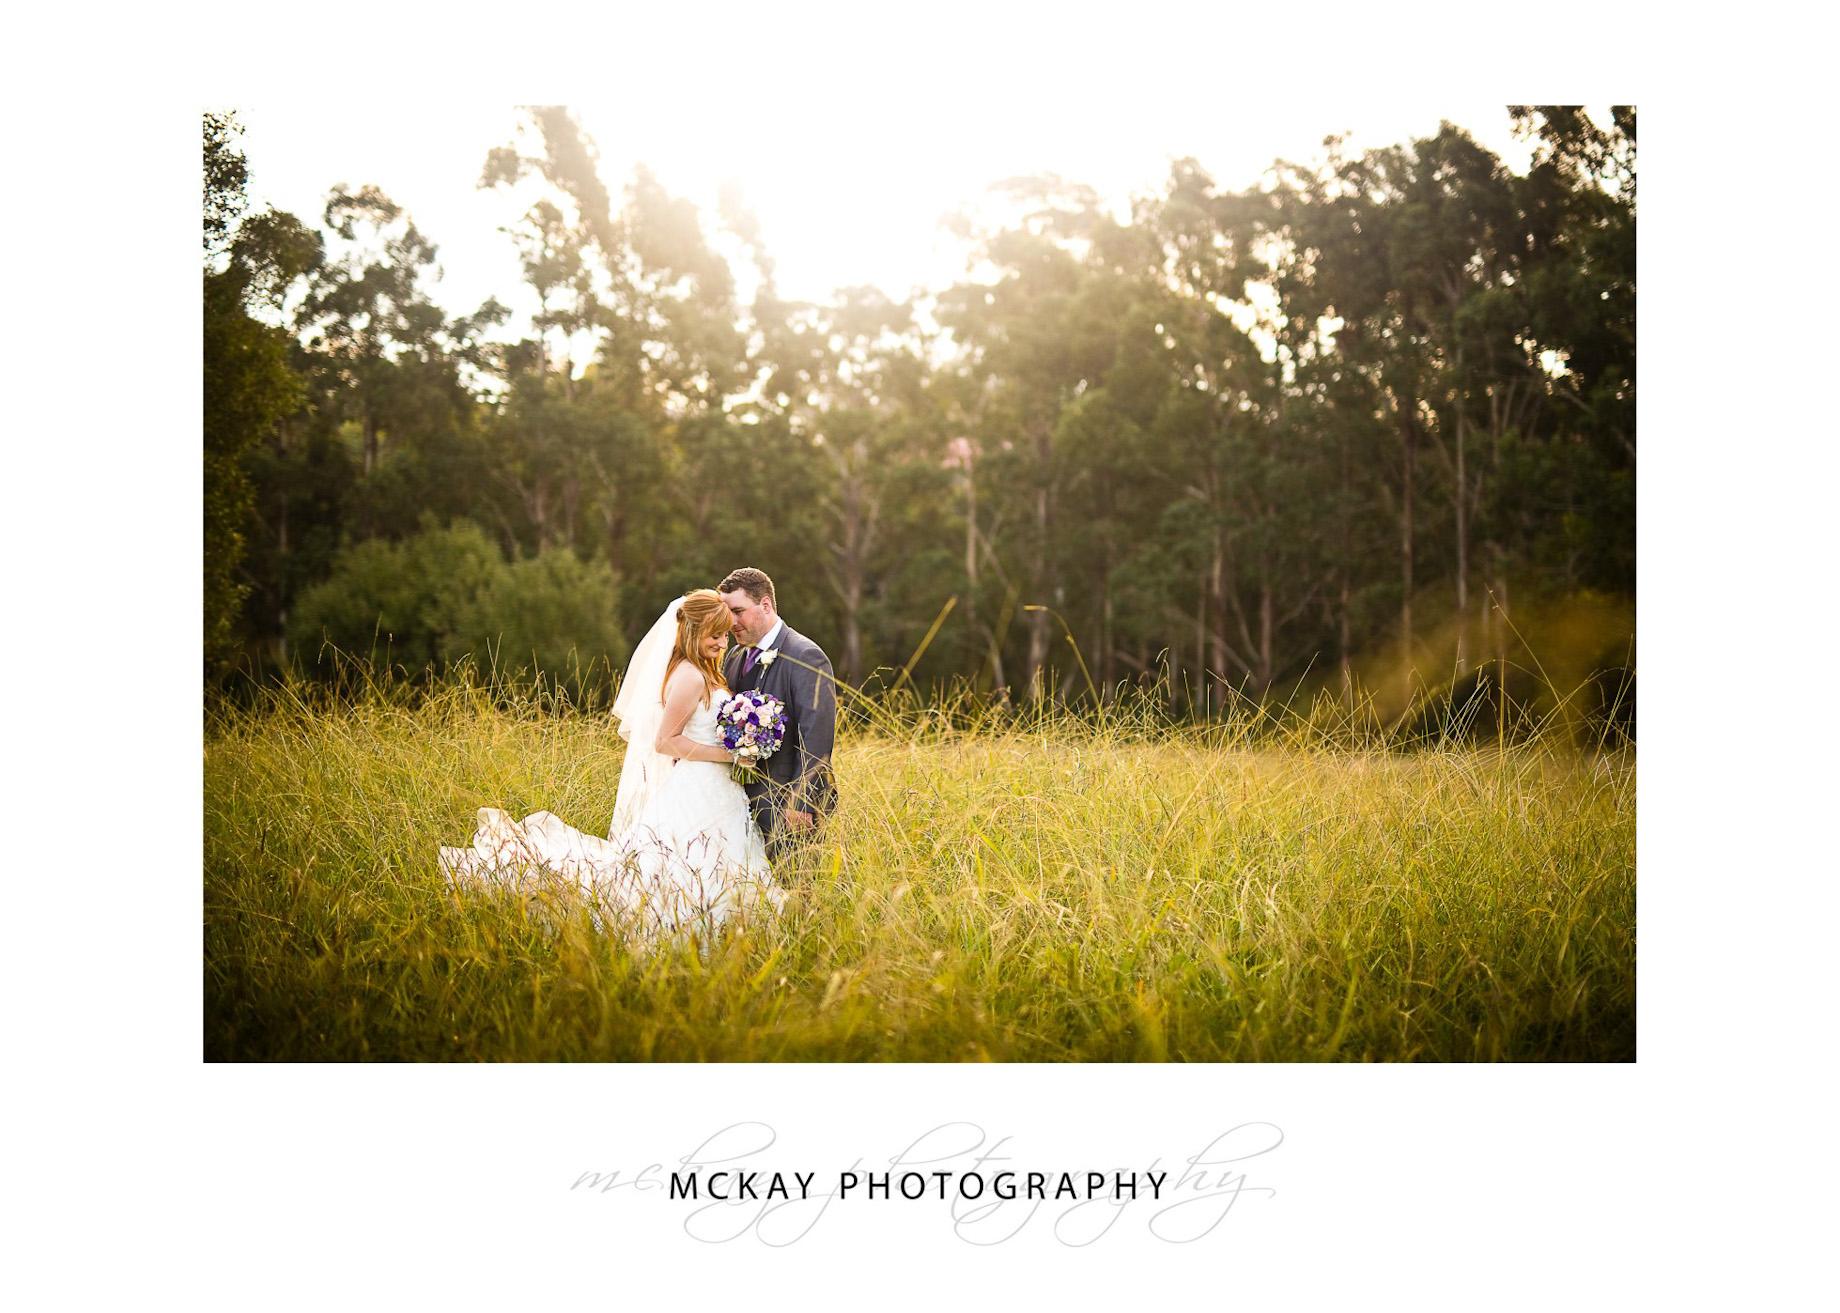 Bride & groom grass field wedding photo Bowral